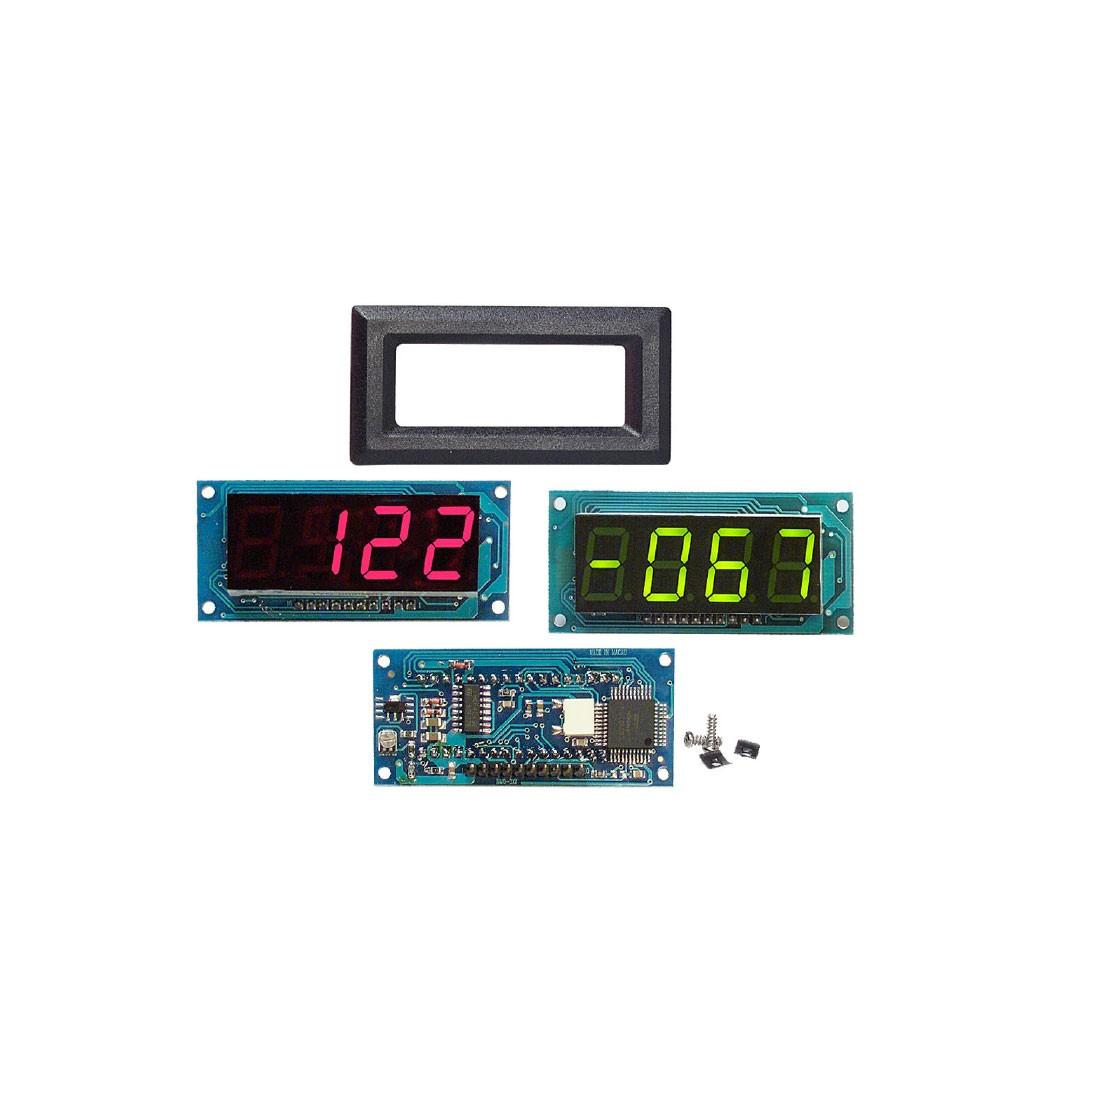 HDMO-3xx Series LED Digital Panel Meter